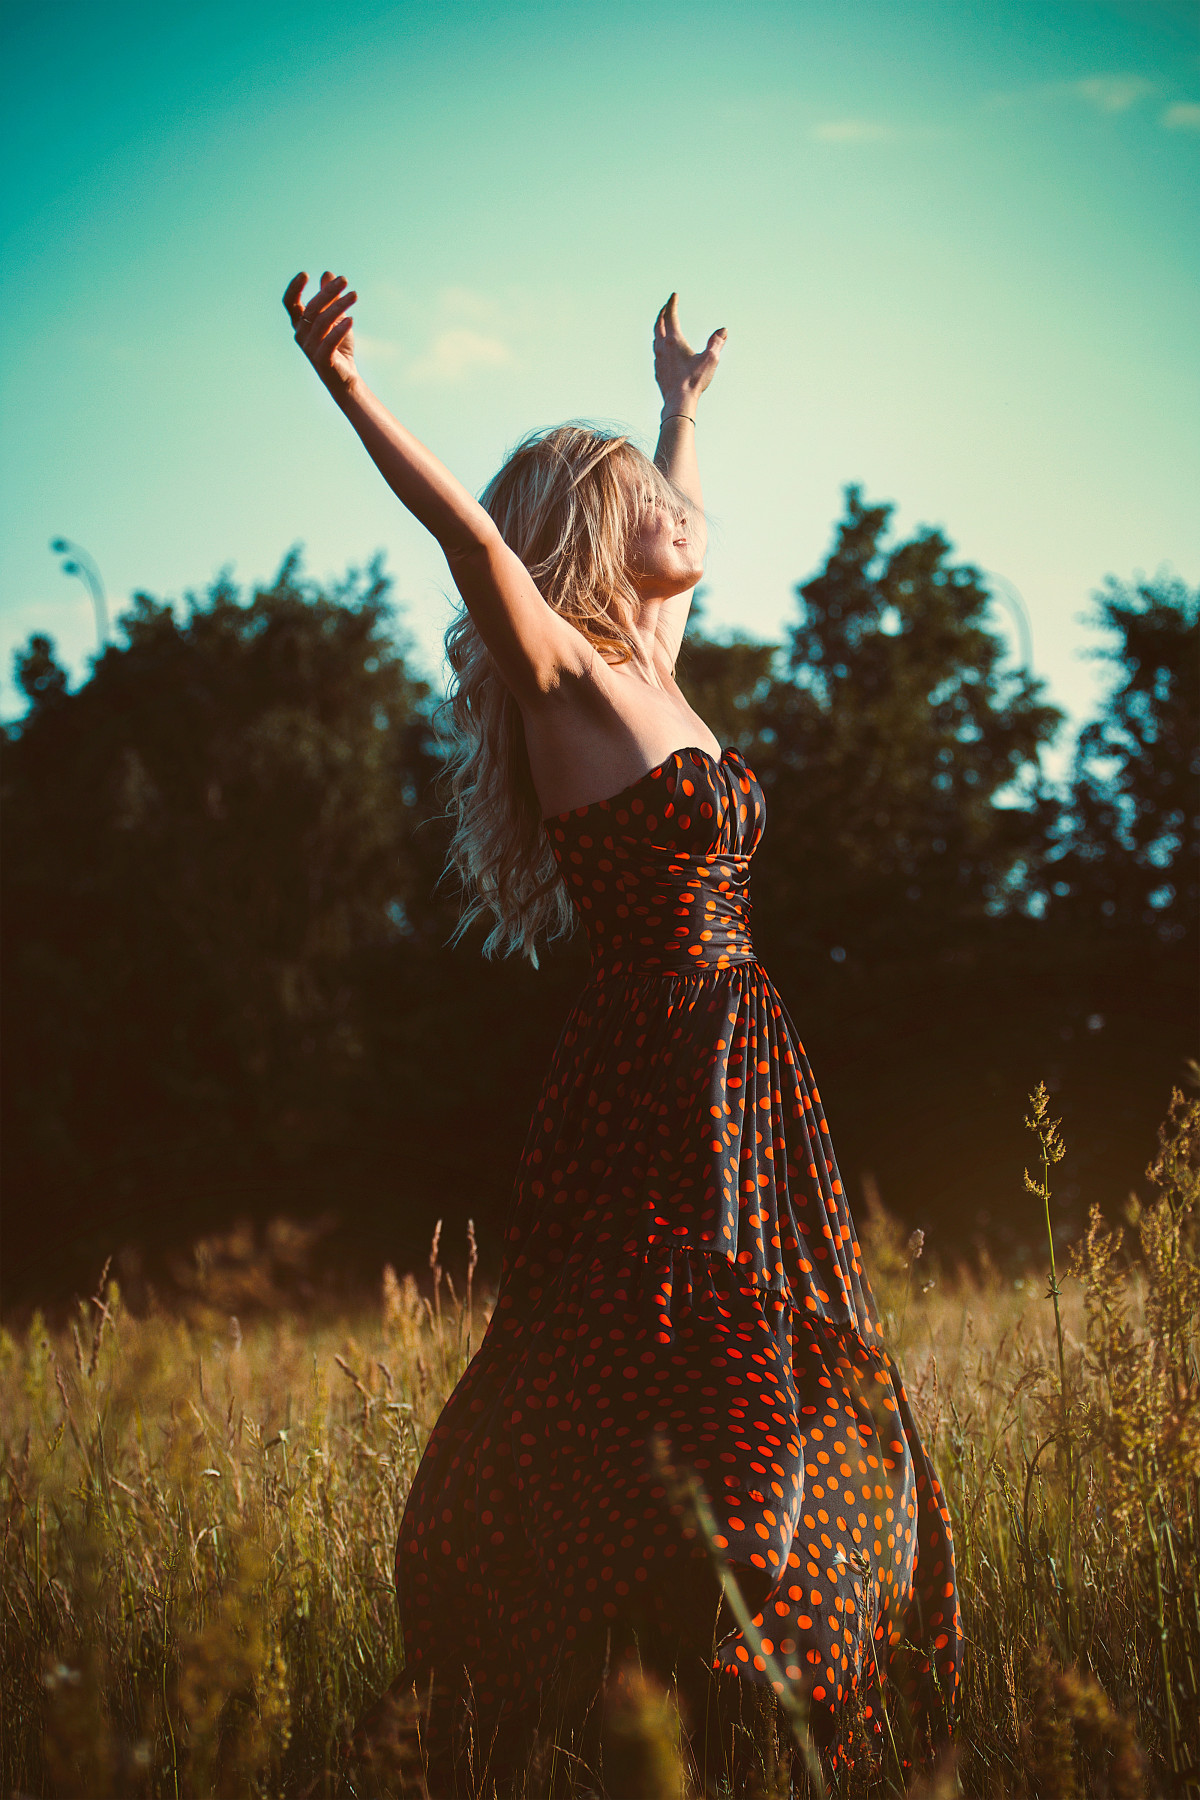 Dance Girl Wallpaper Hd Free Images Nature People Sky Girl Woman Sunlight